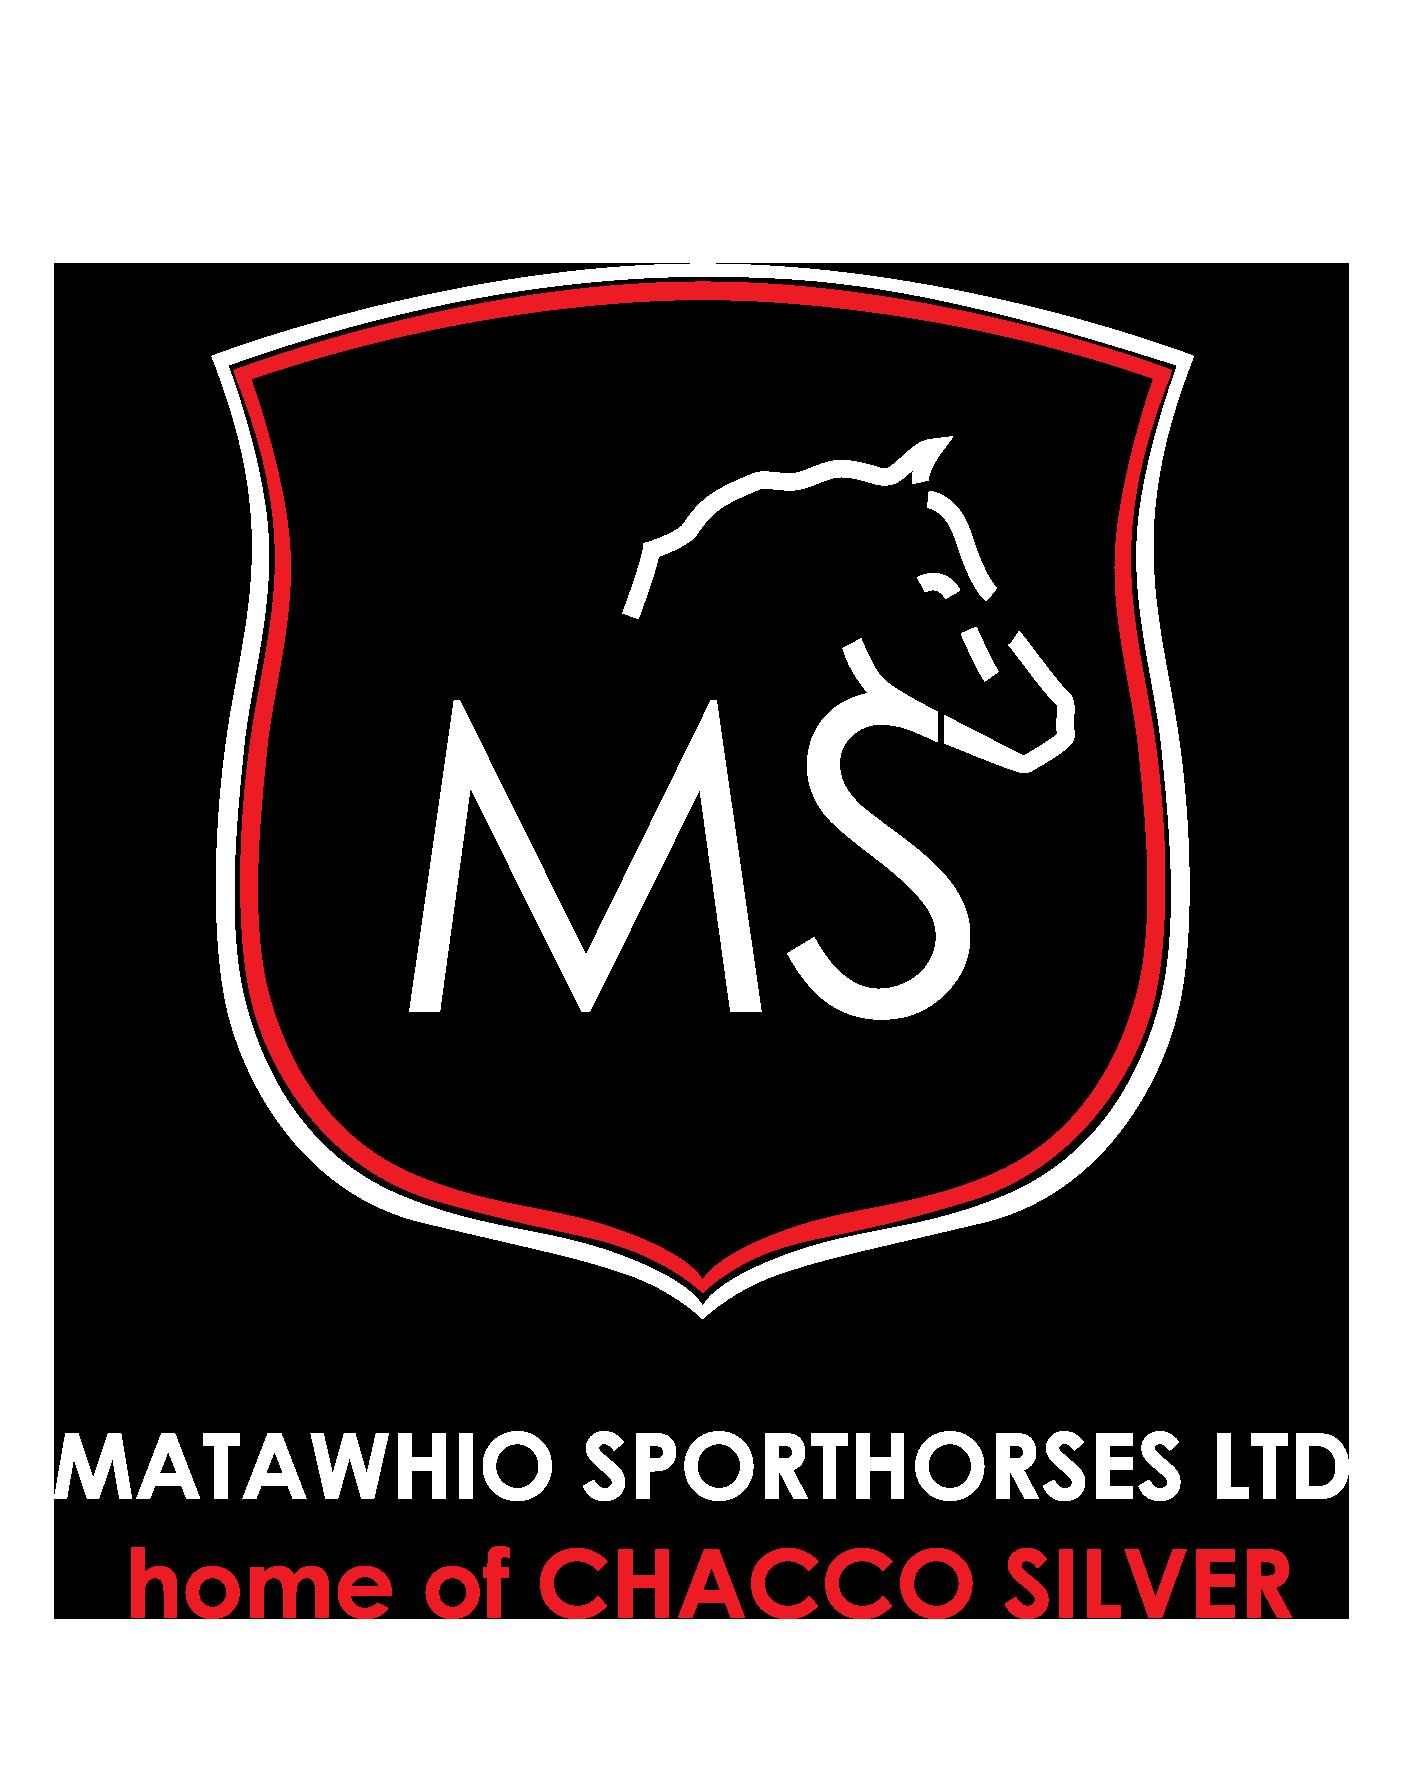 Matawhio Sporthorses